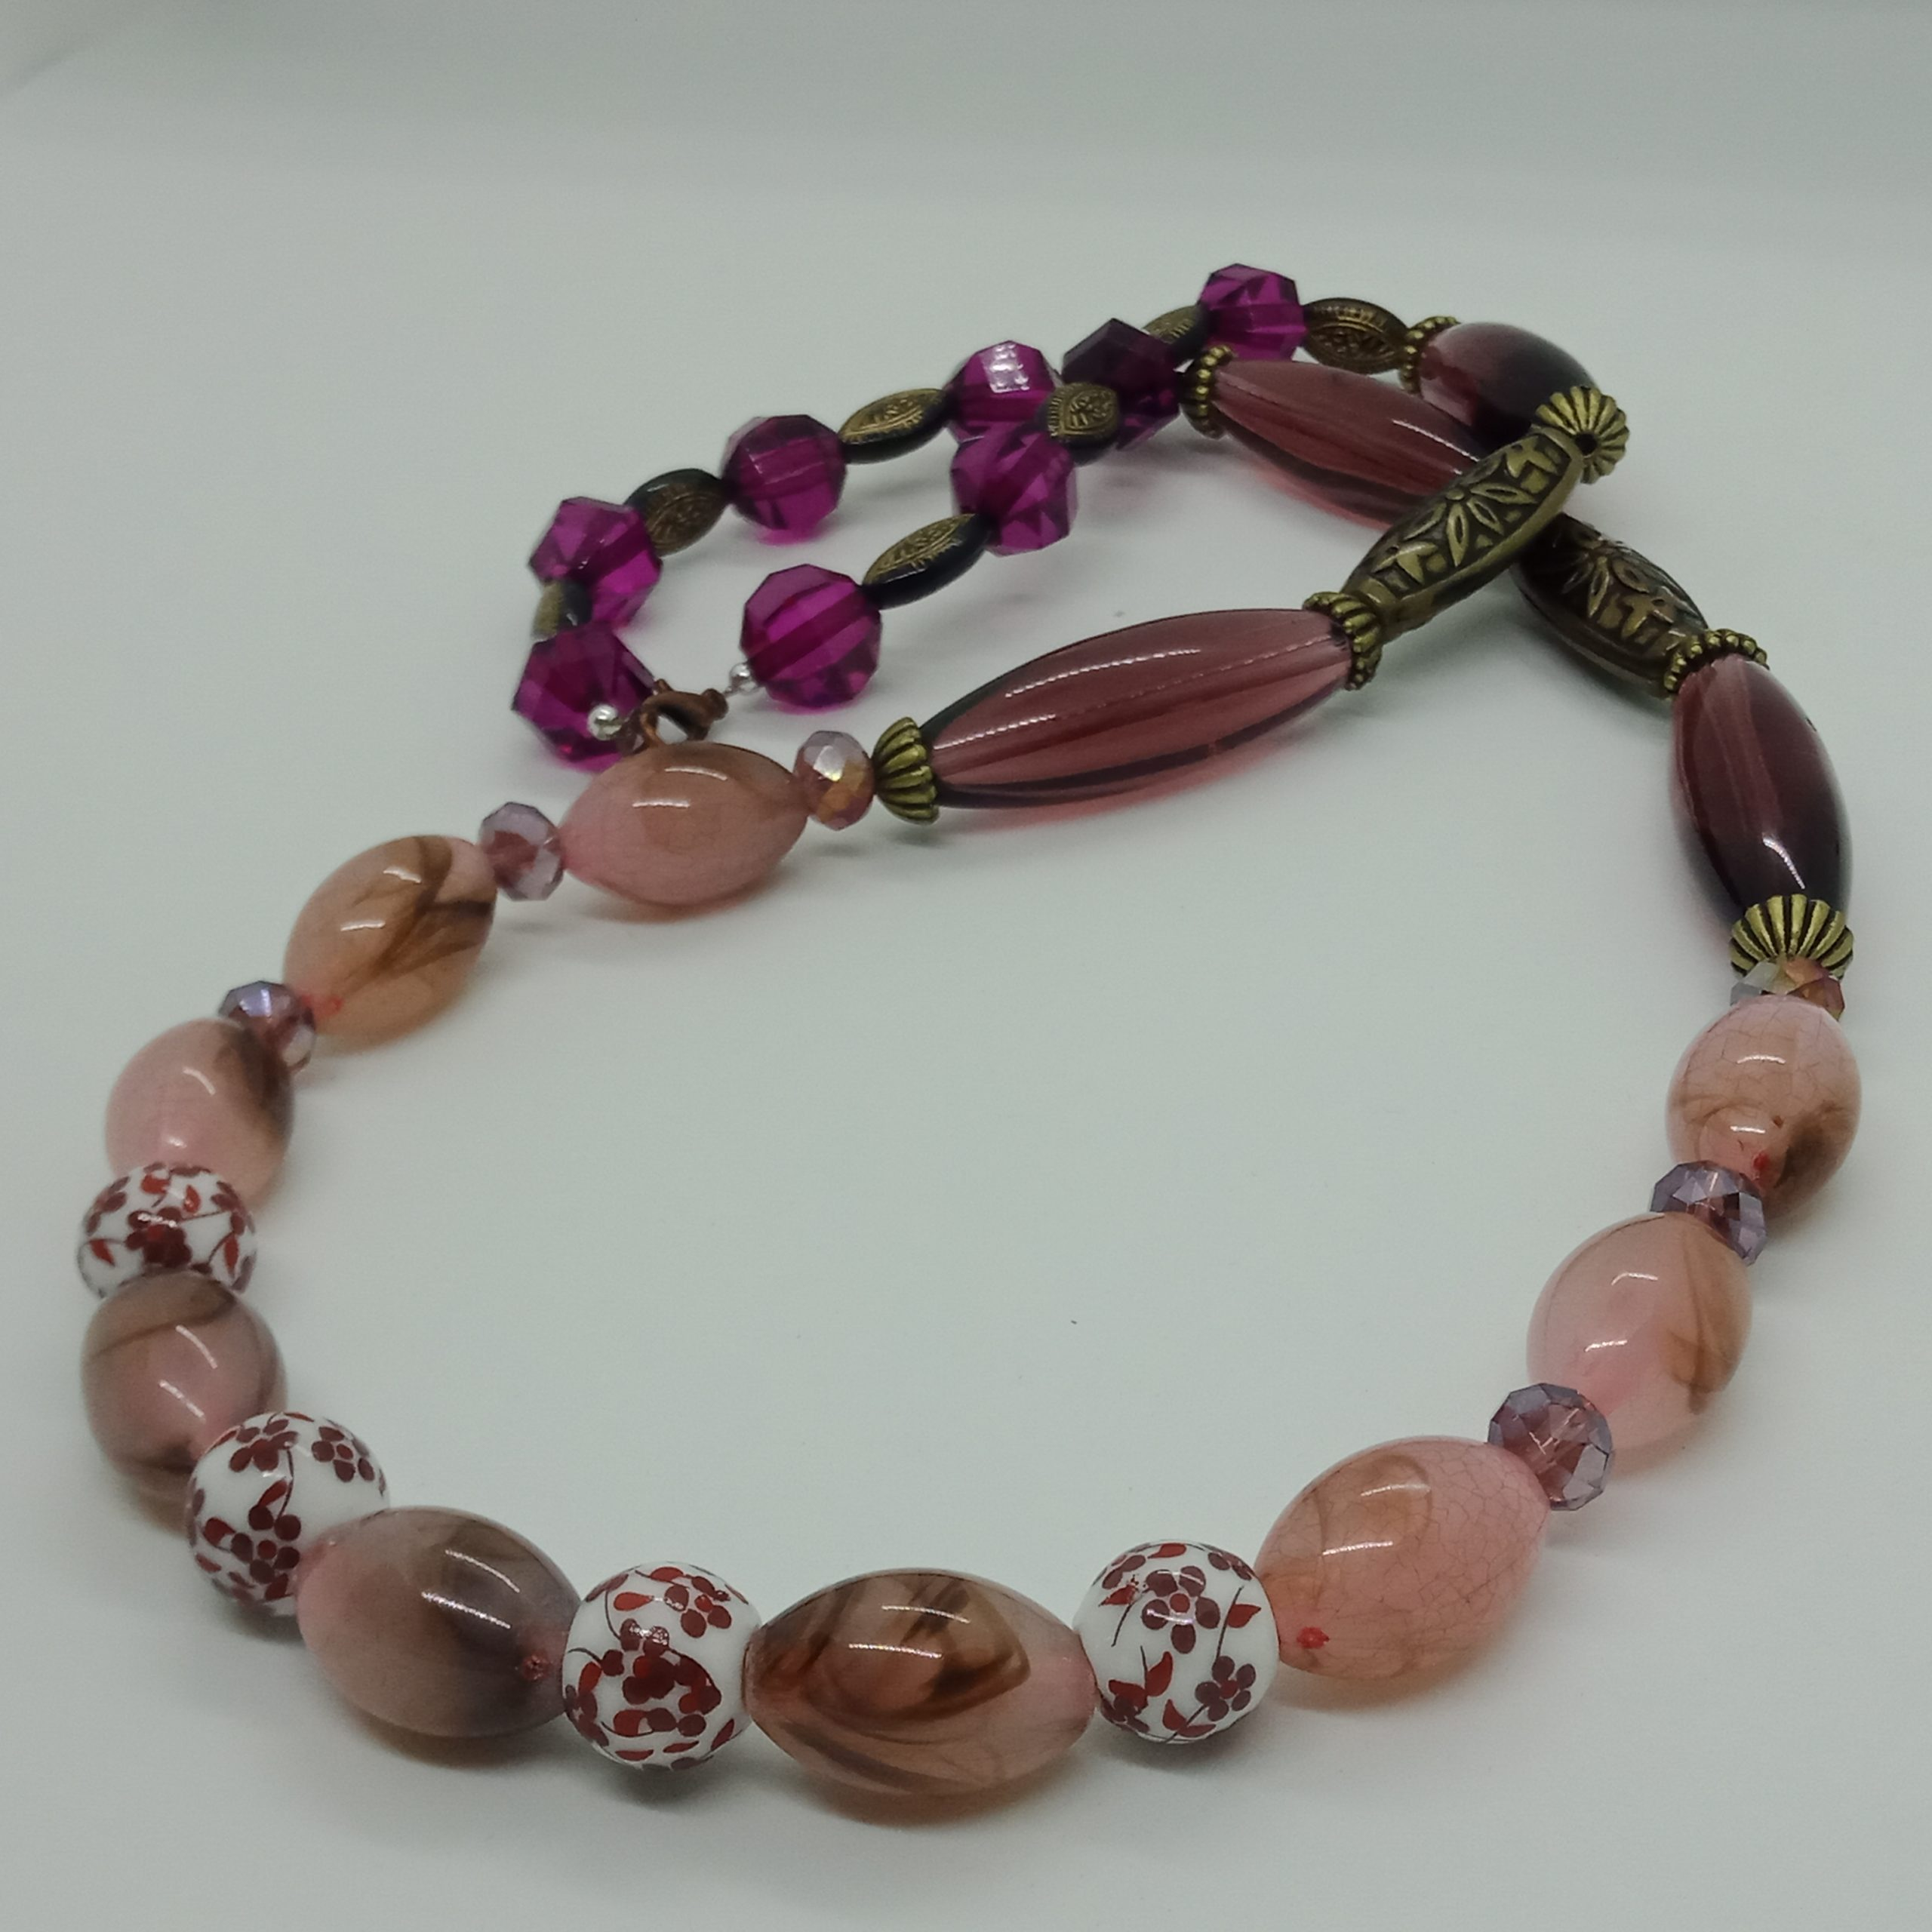 Ceramic Beads Necklace